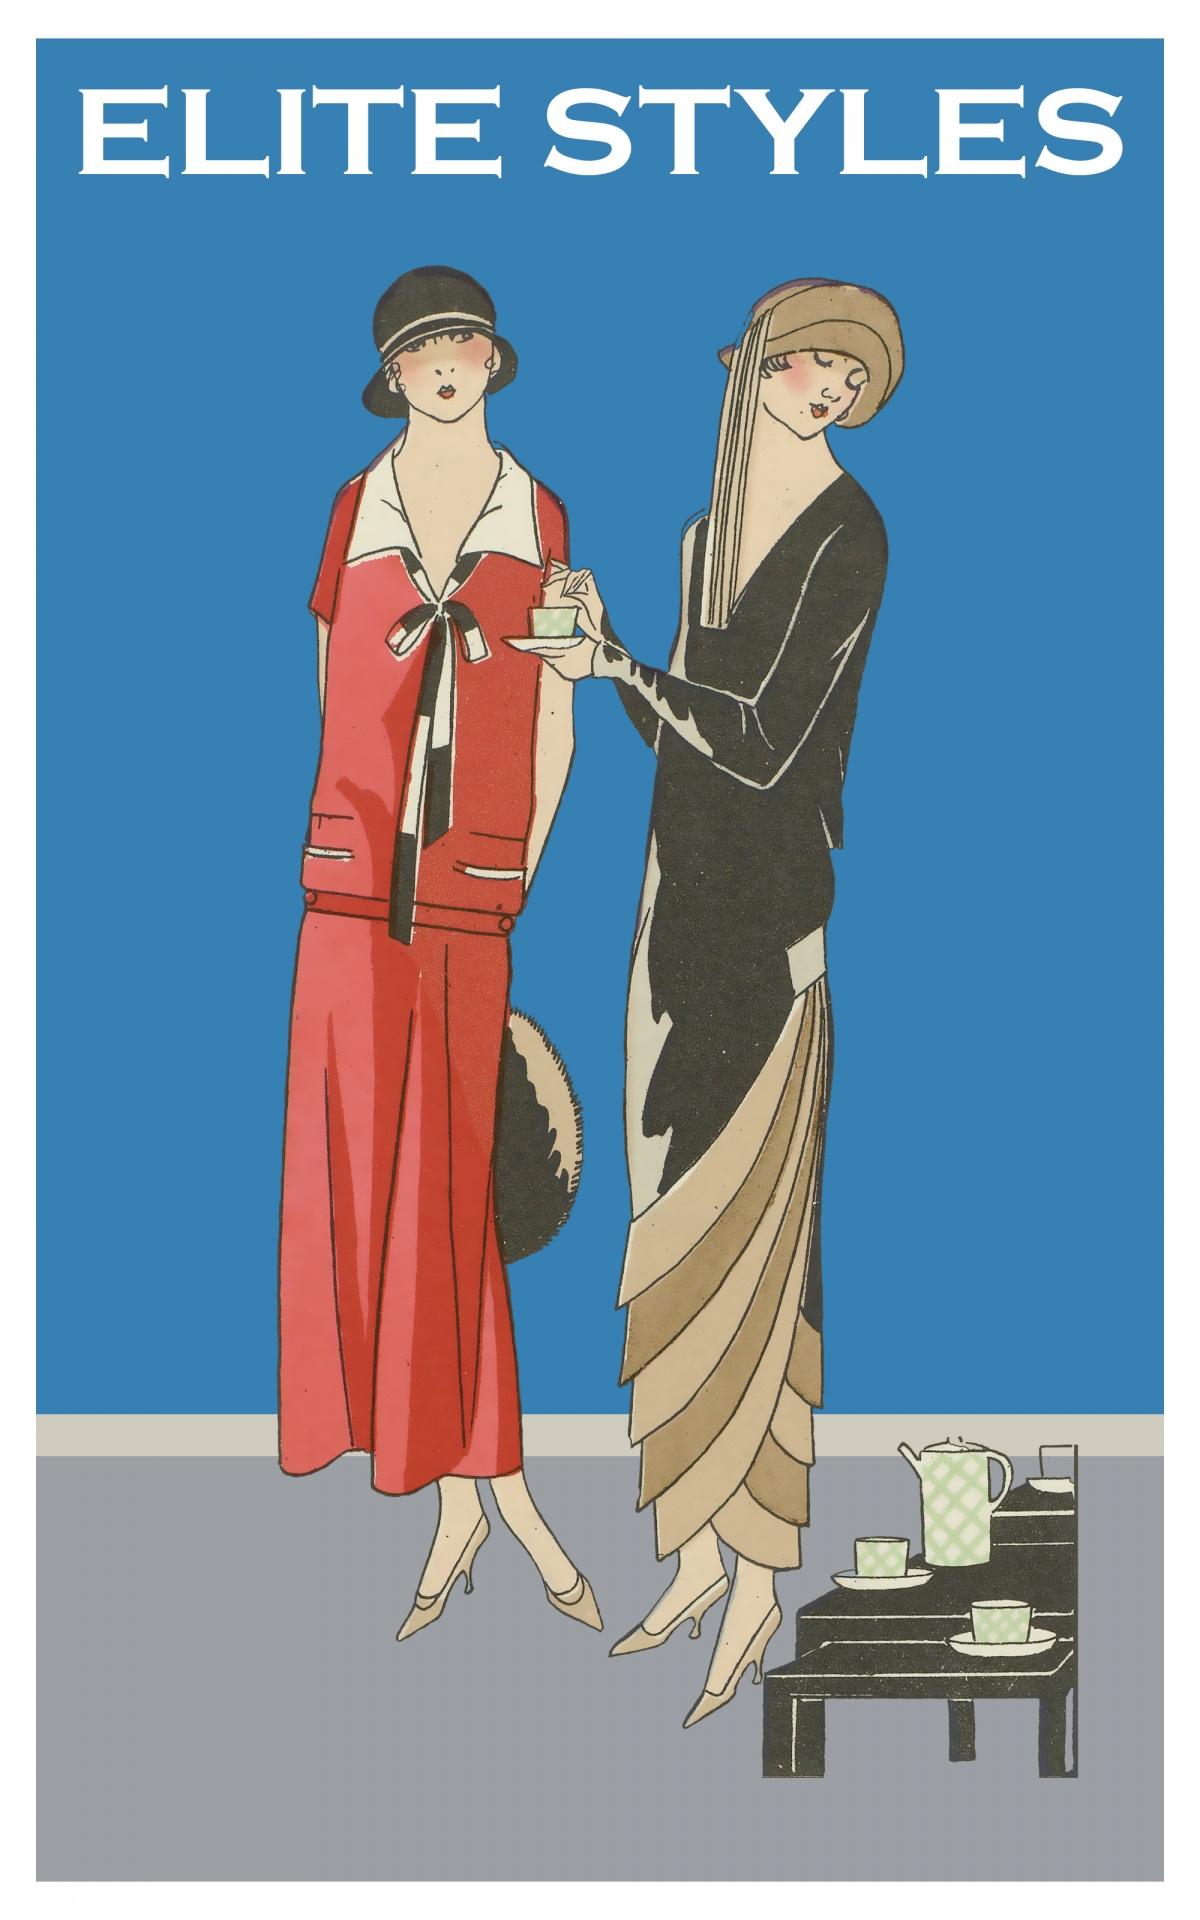 vintage-1920s-women-fashion